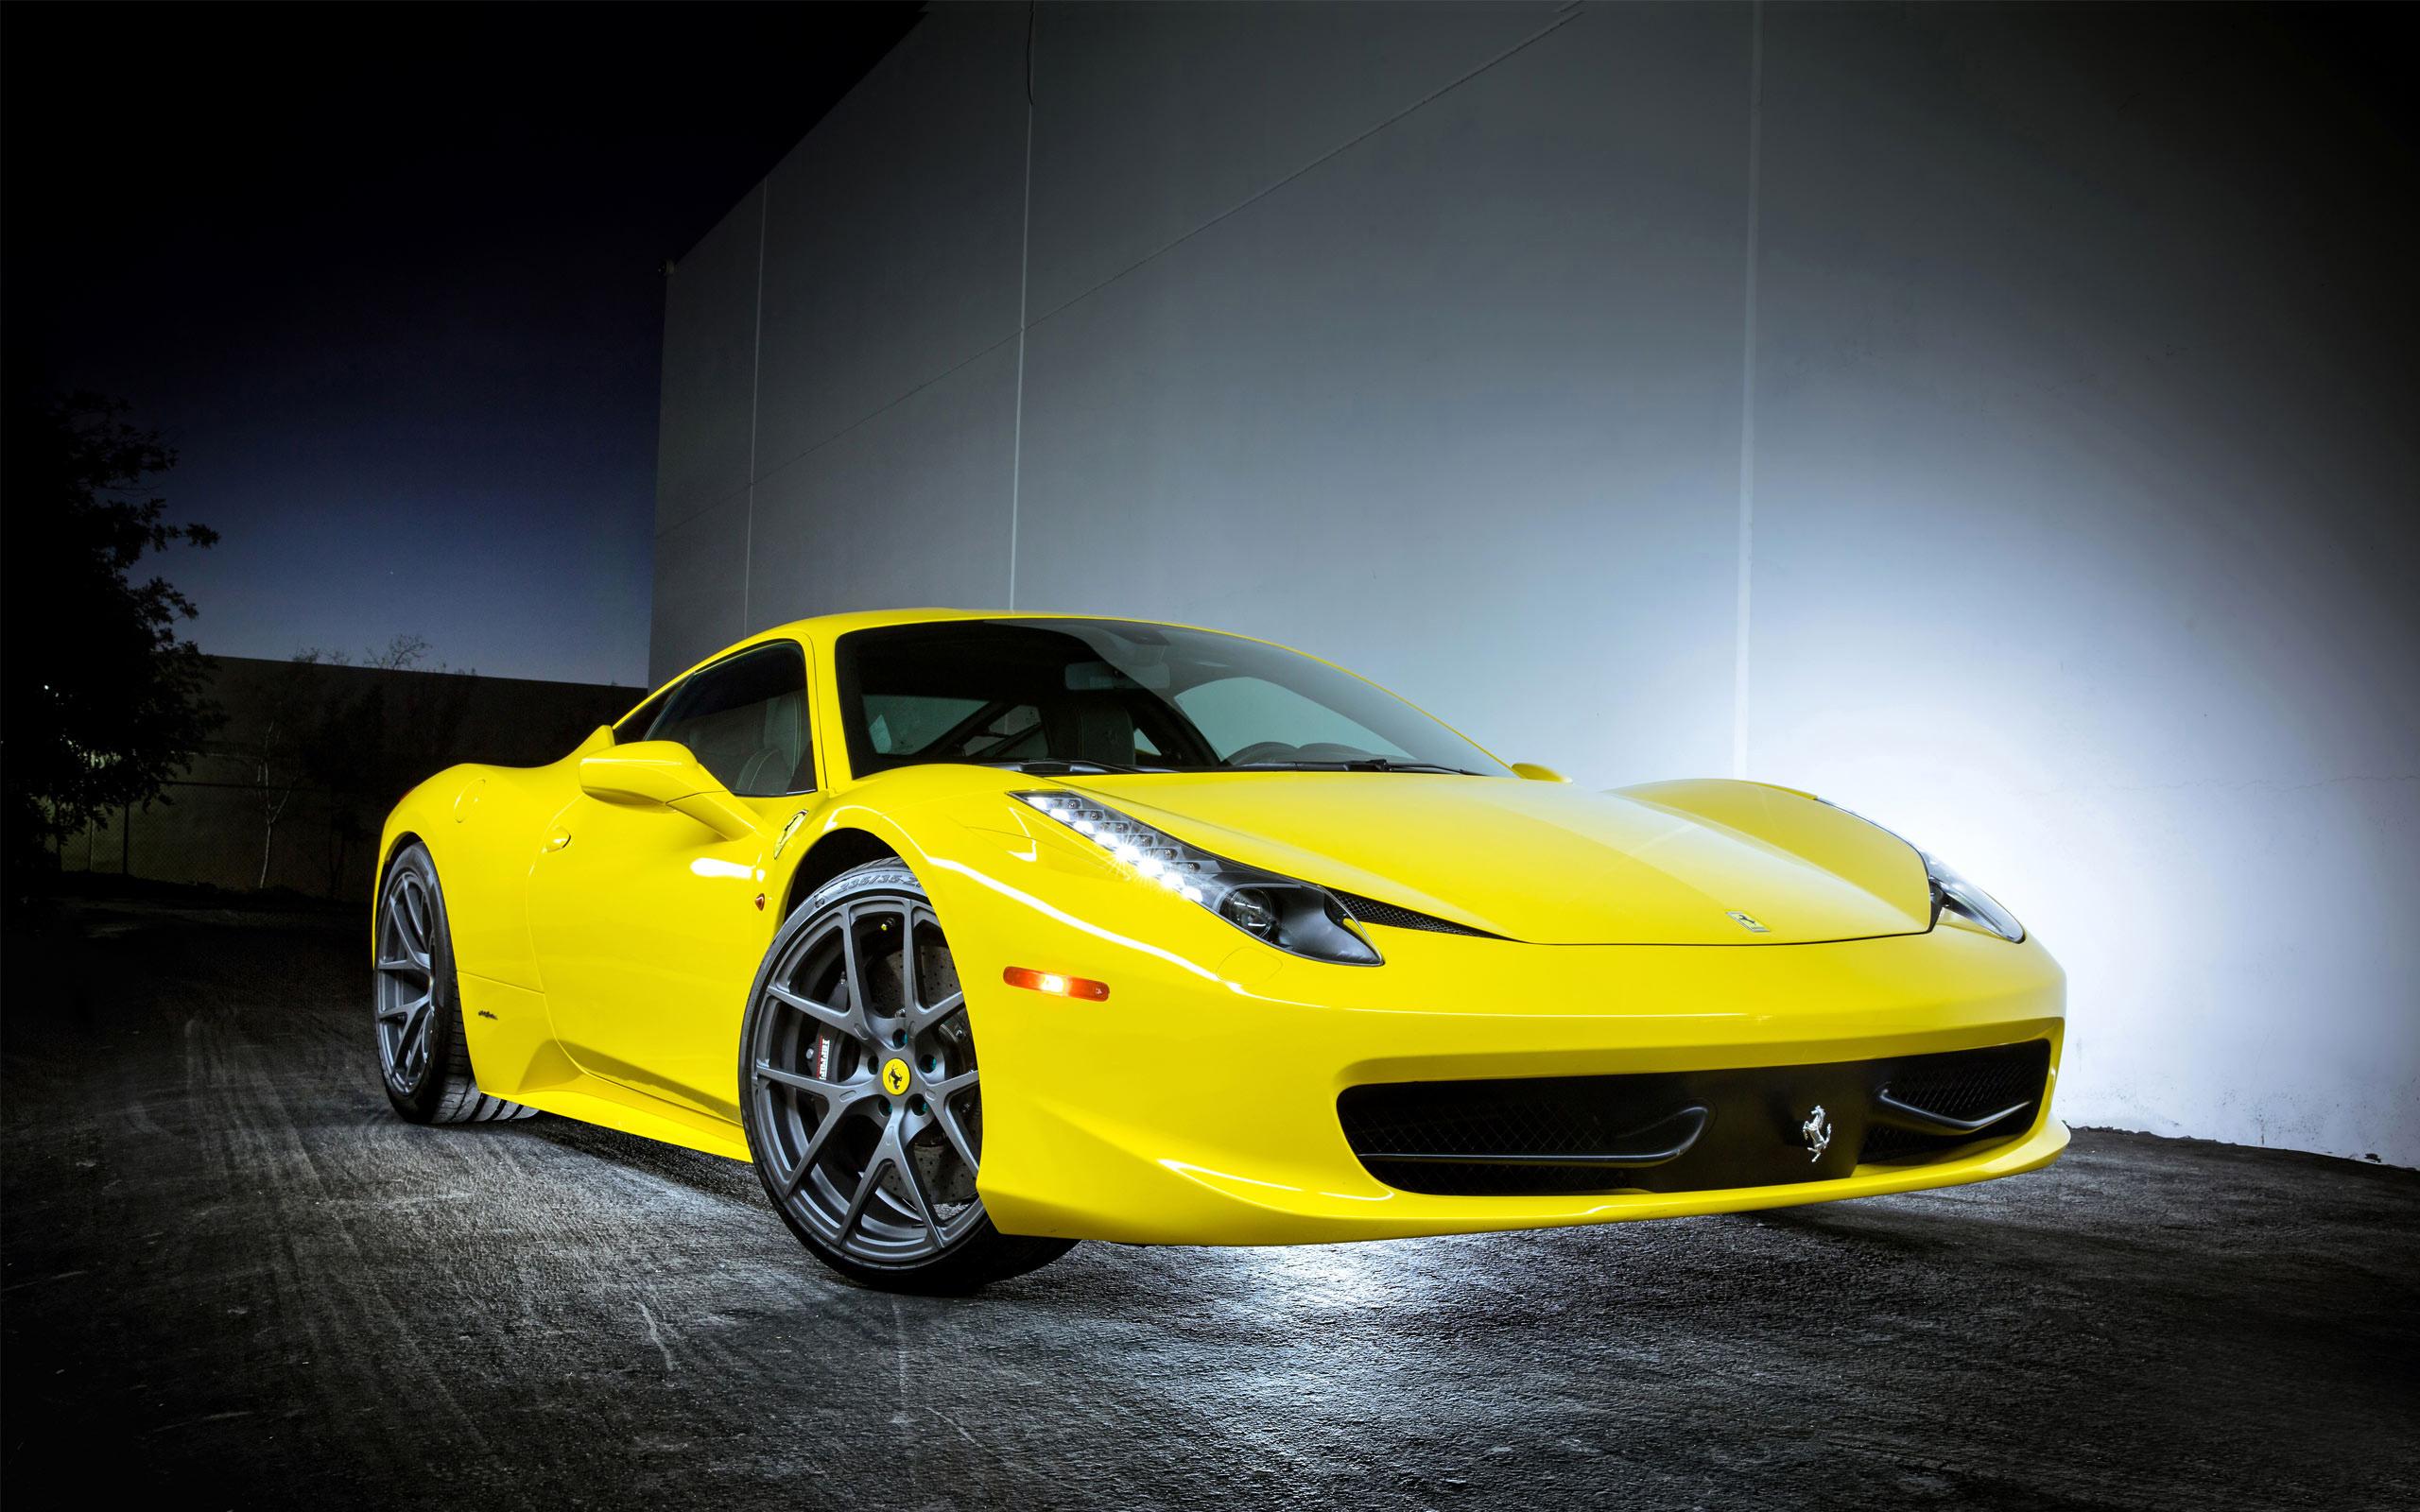 2013 Ferrari 458 Italia Vorsteiner Wallpaper | HD Car Wallpapers ...